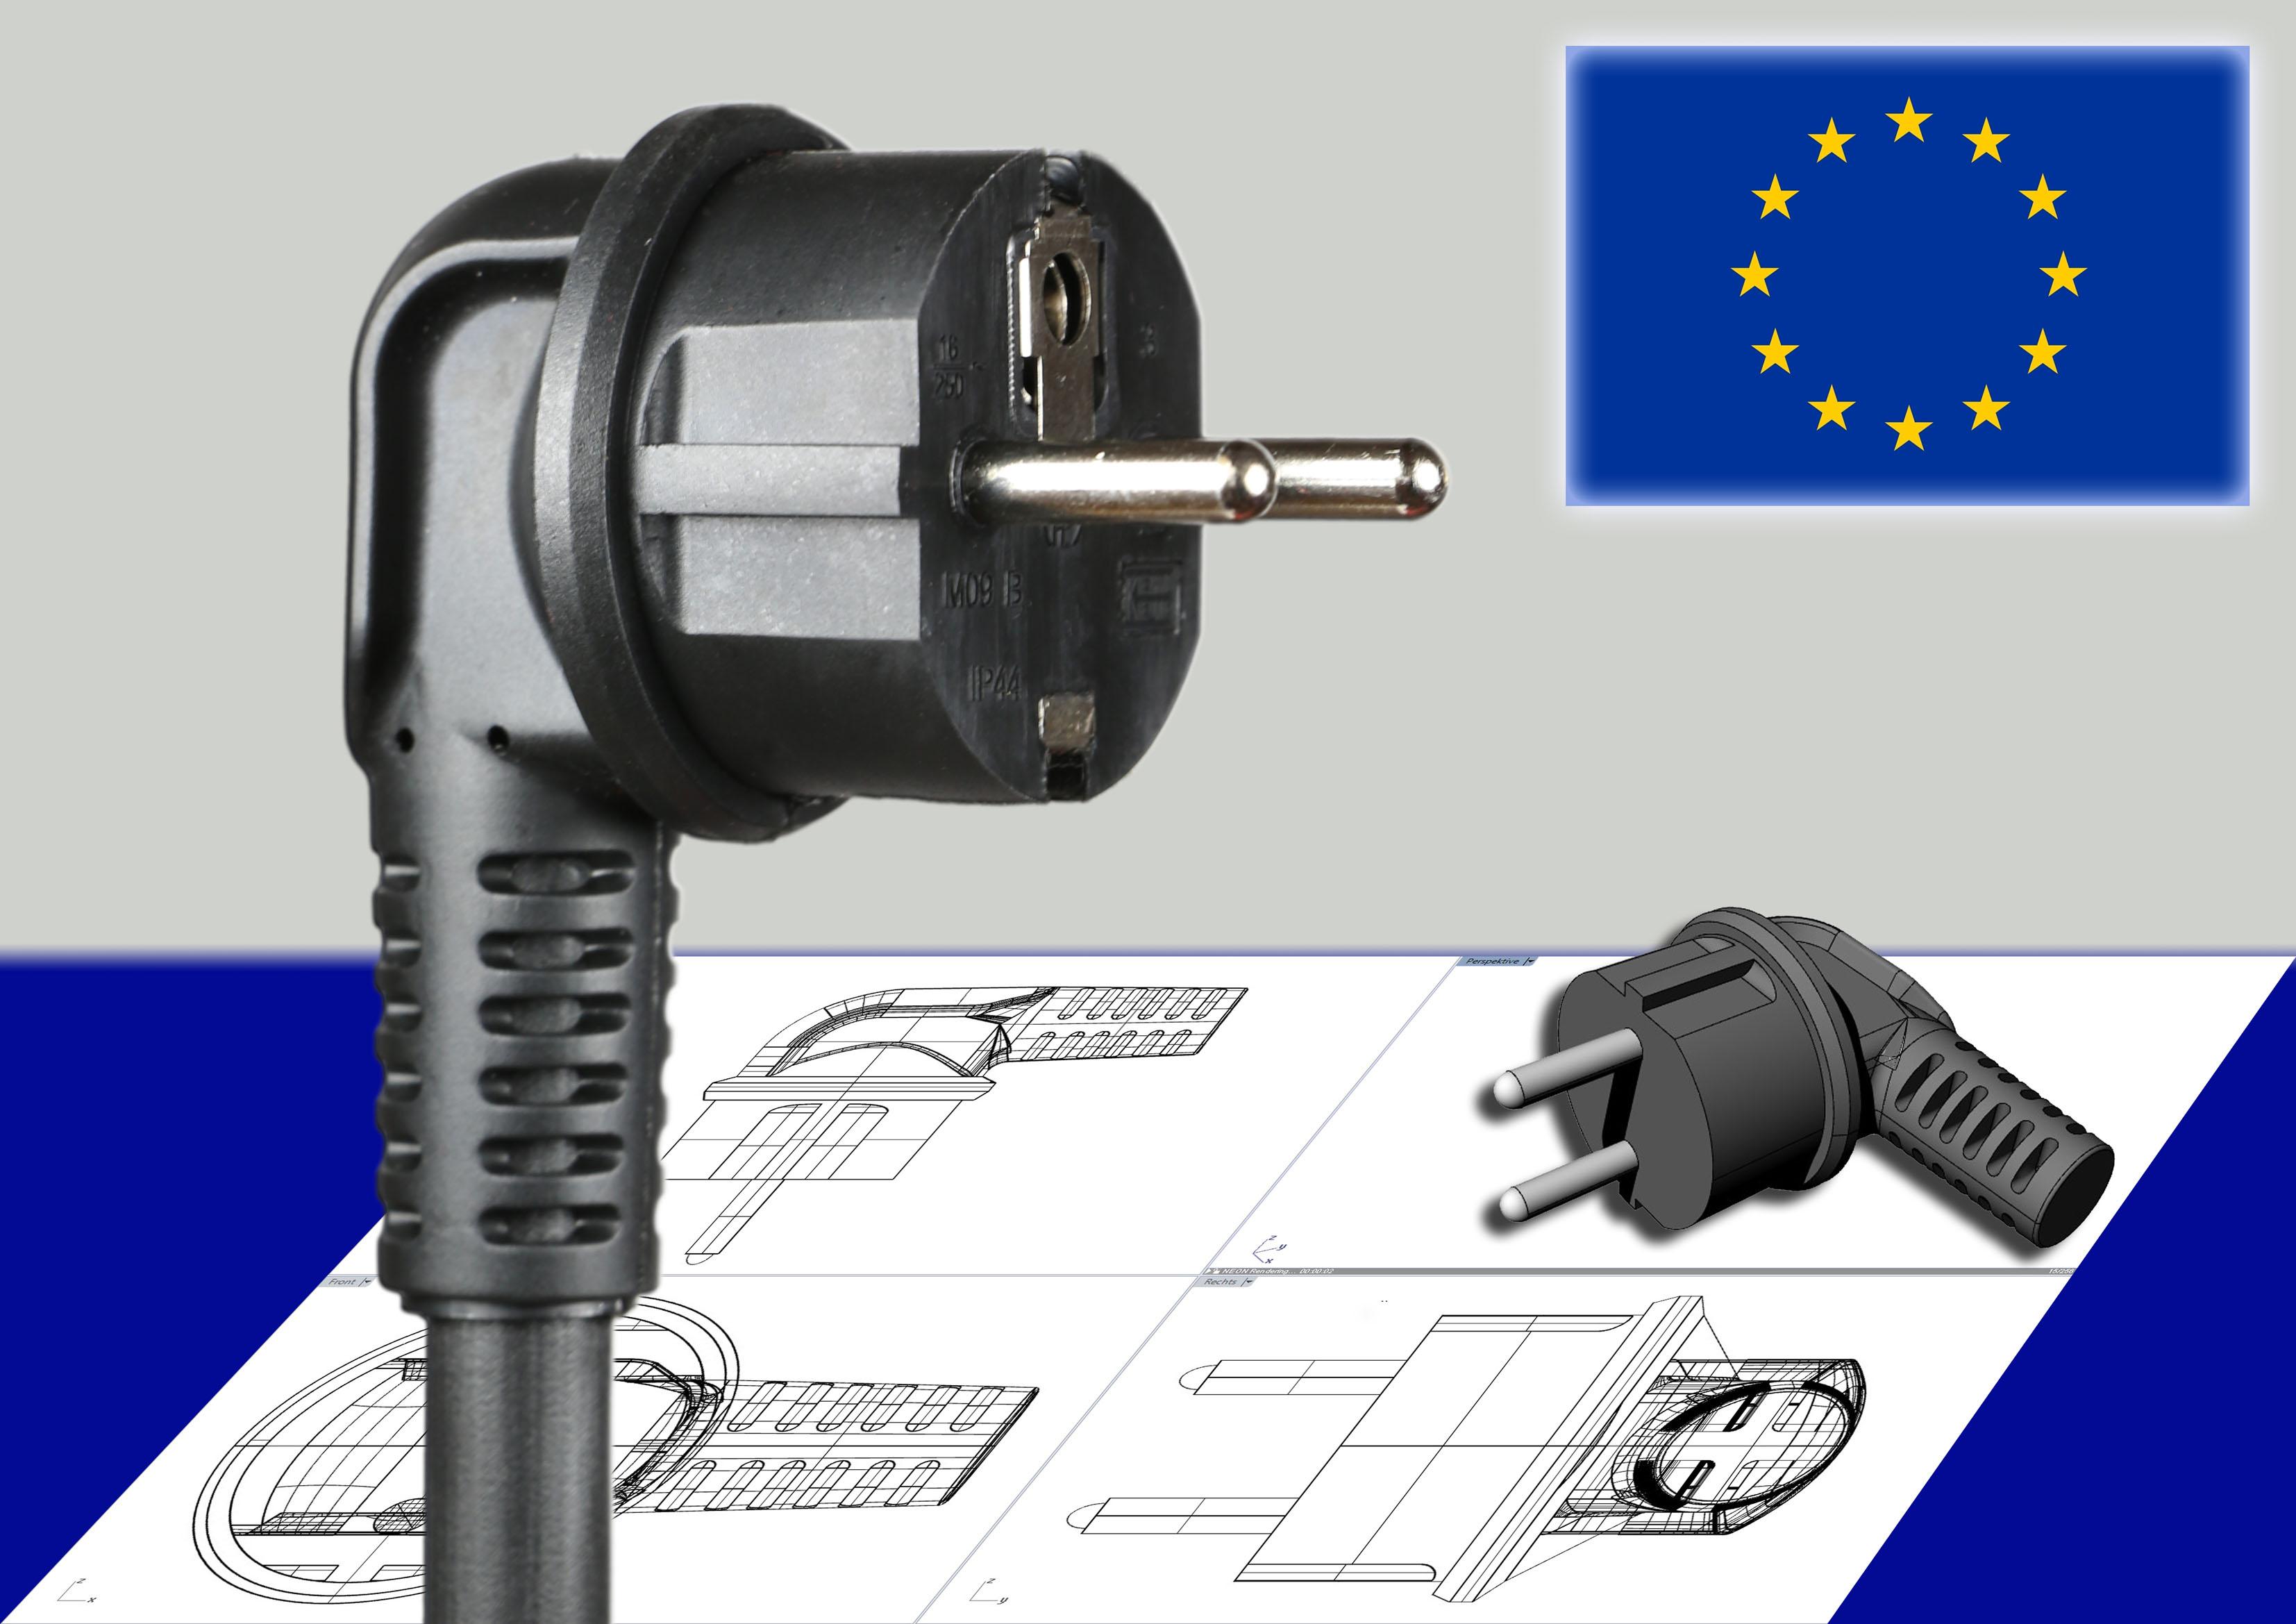 Winkelstecker EU